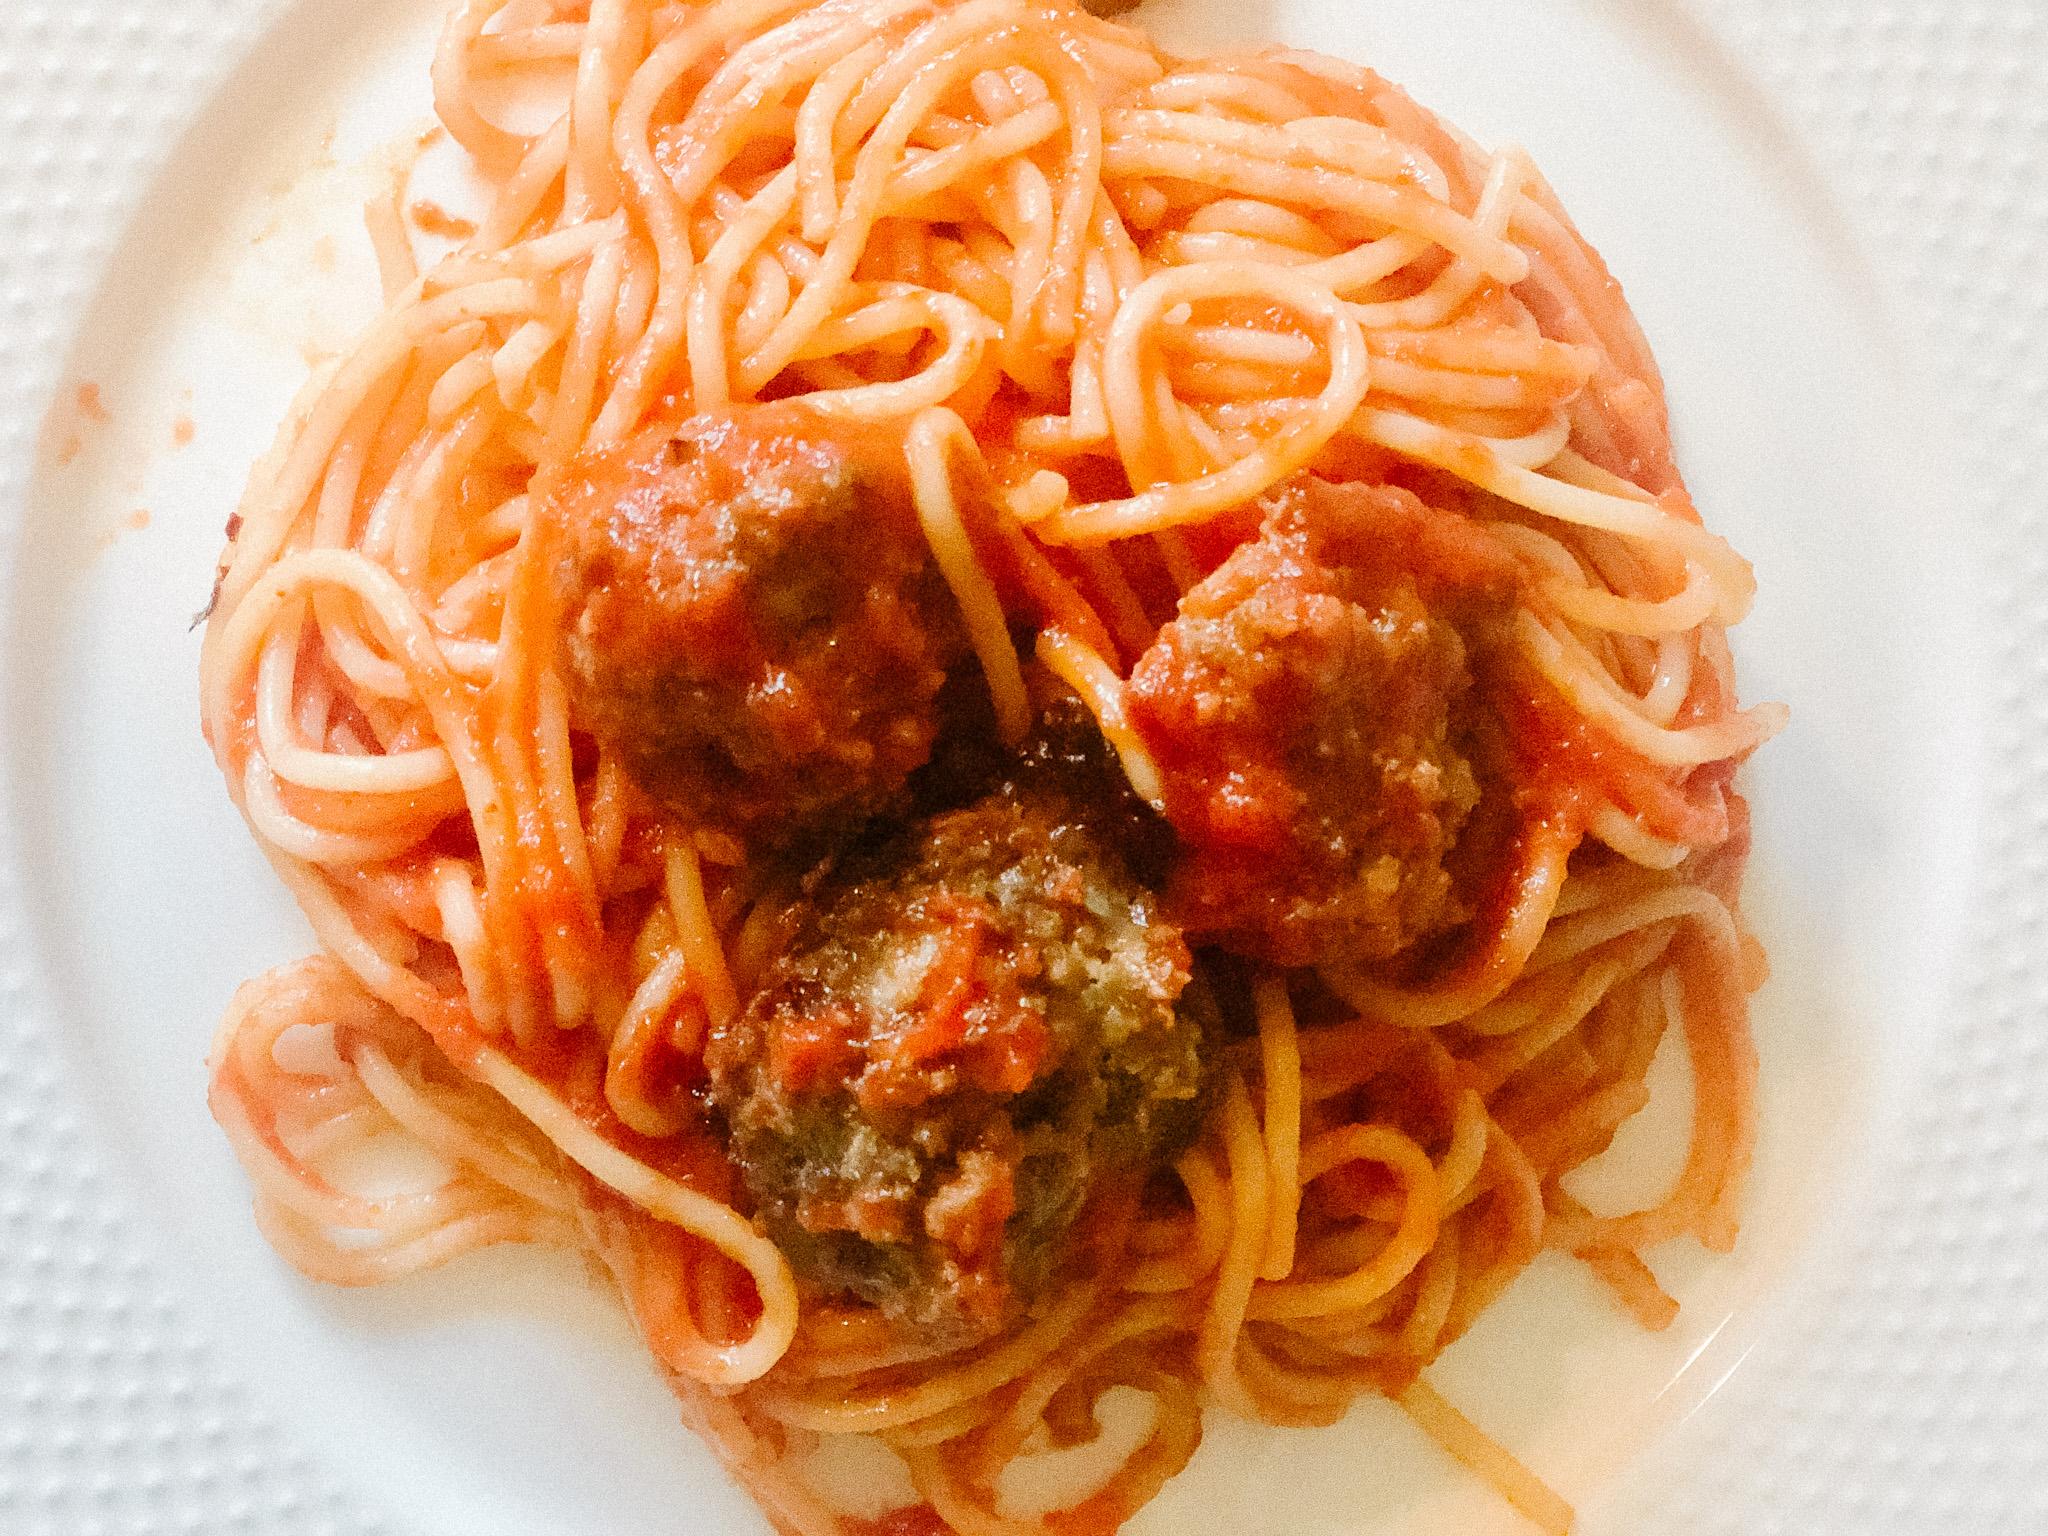 Homemade beef meatballs sitting on top of spaghetti